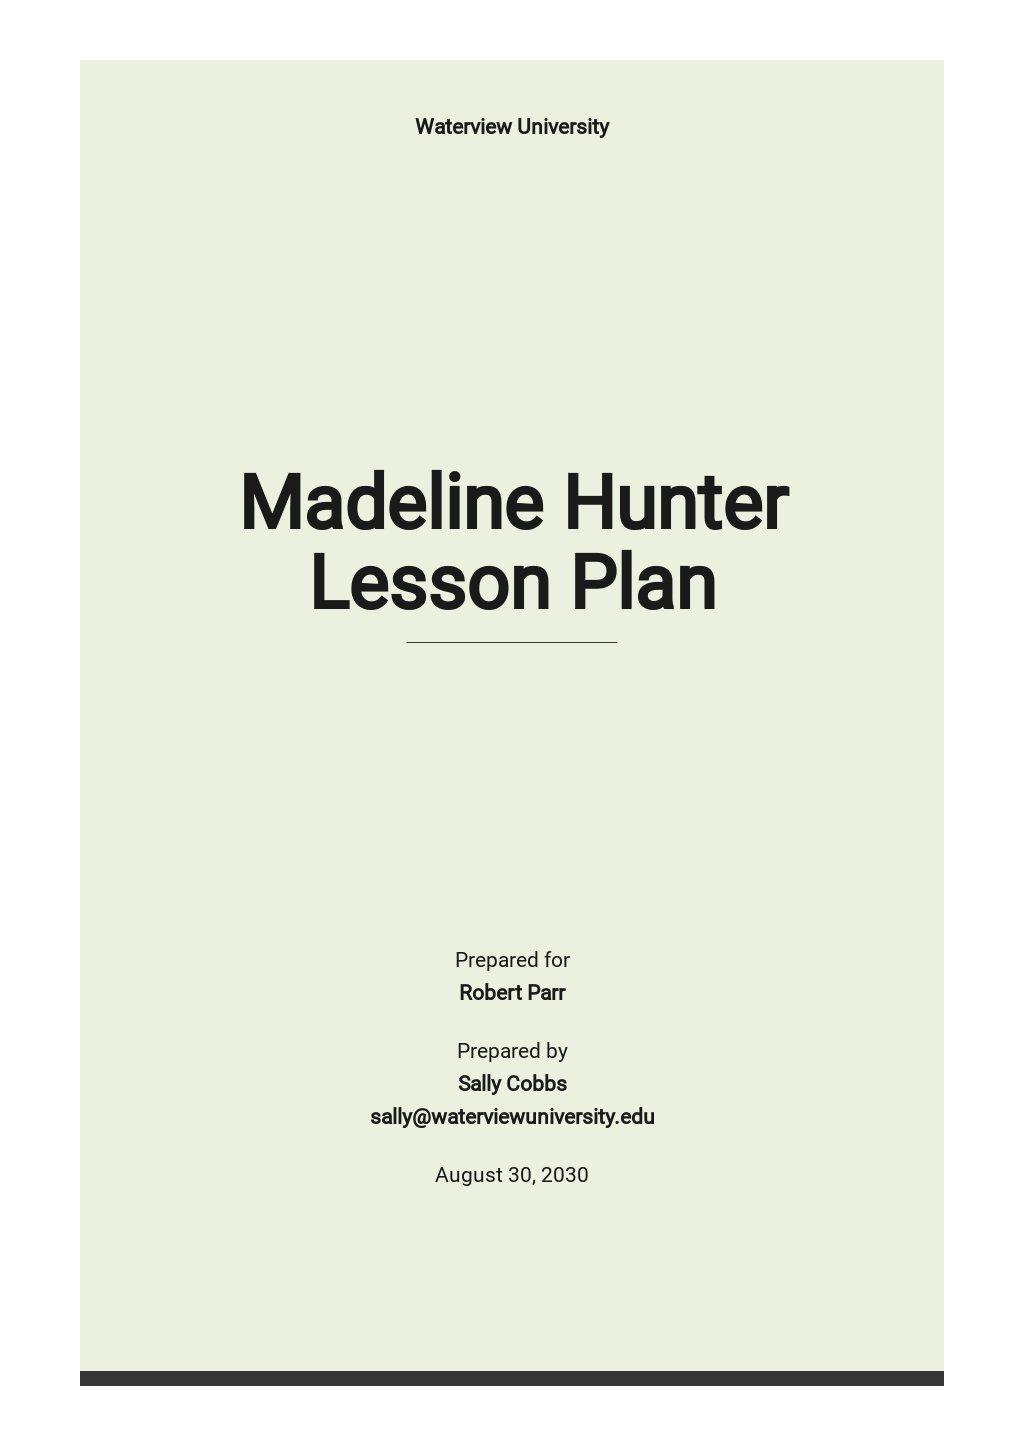 Madeline Hunter Lesson Plan Template.jpe